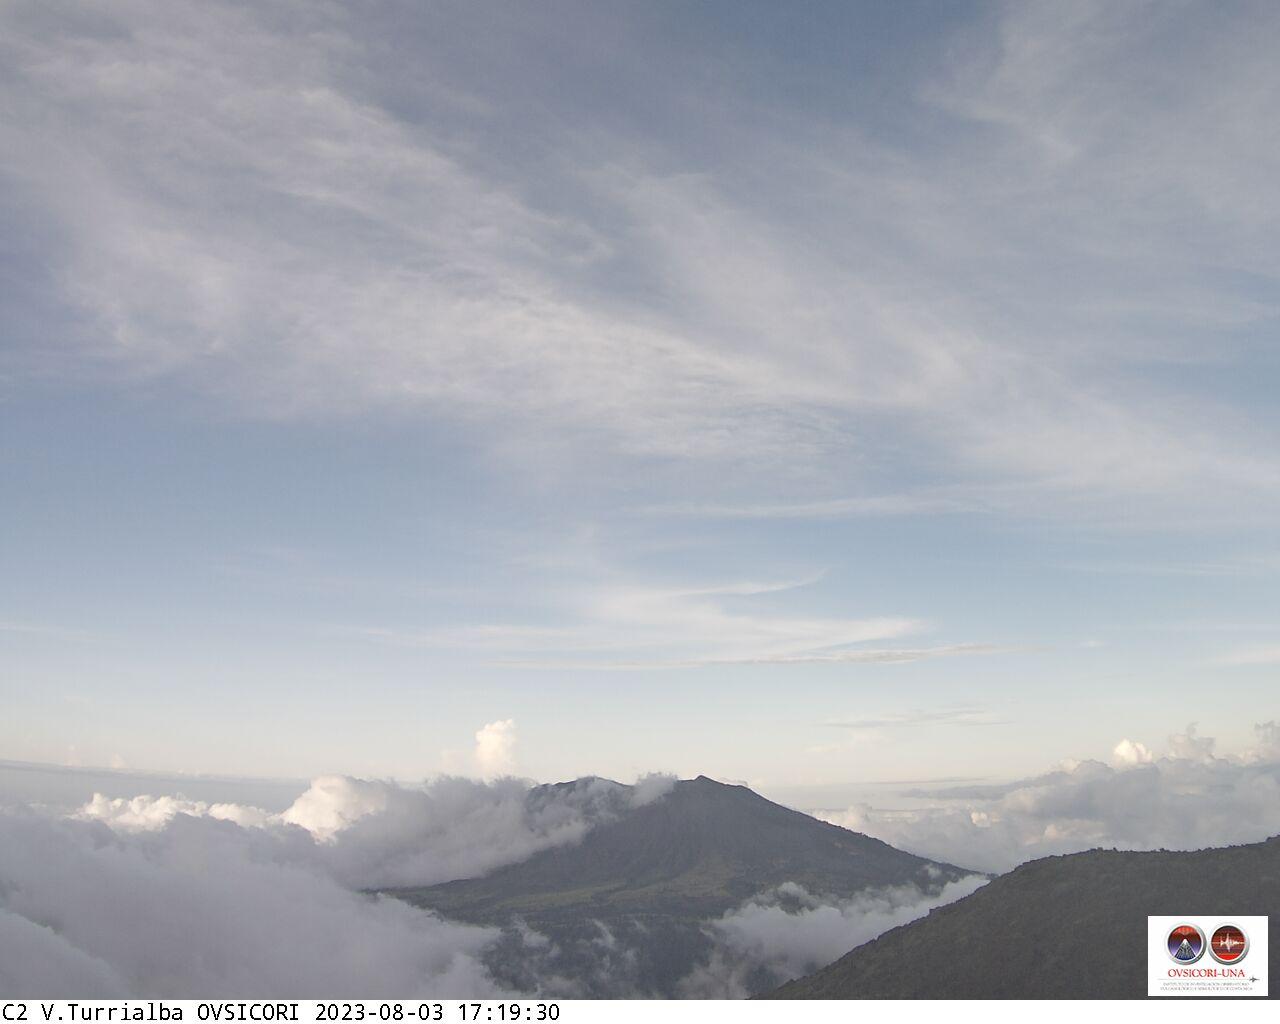 Volcán Irazú en Vivo. Cámara Web del OVSICORI